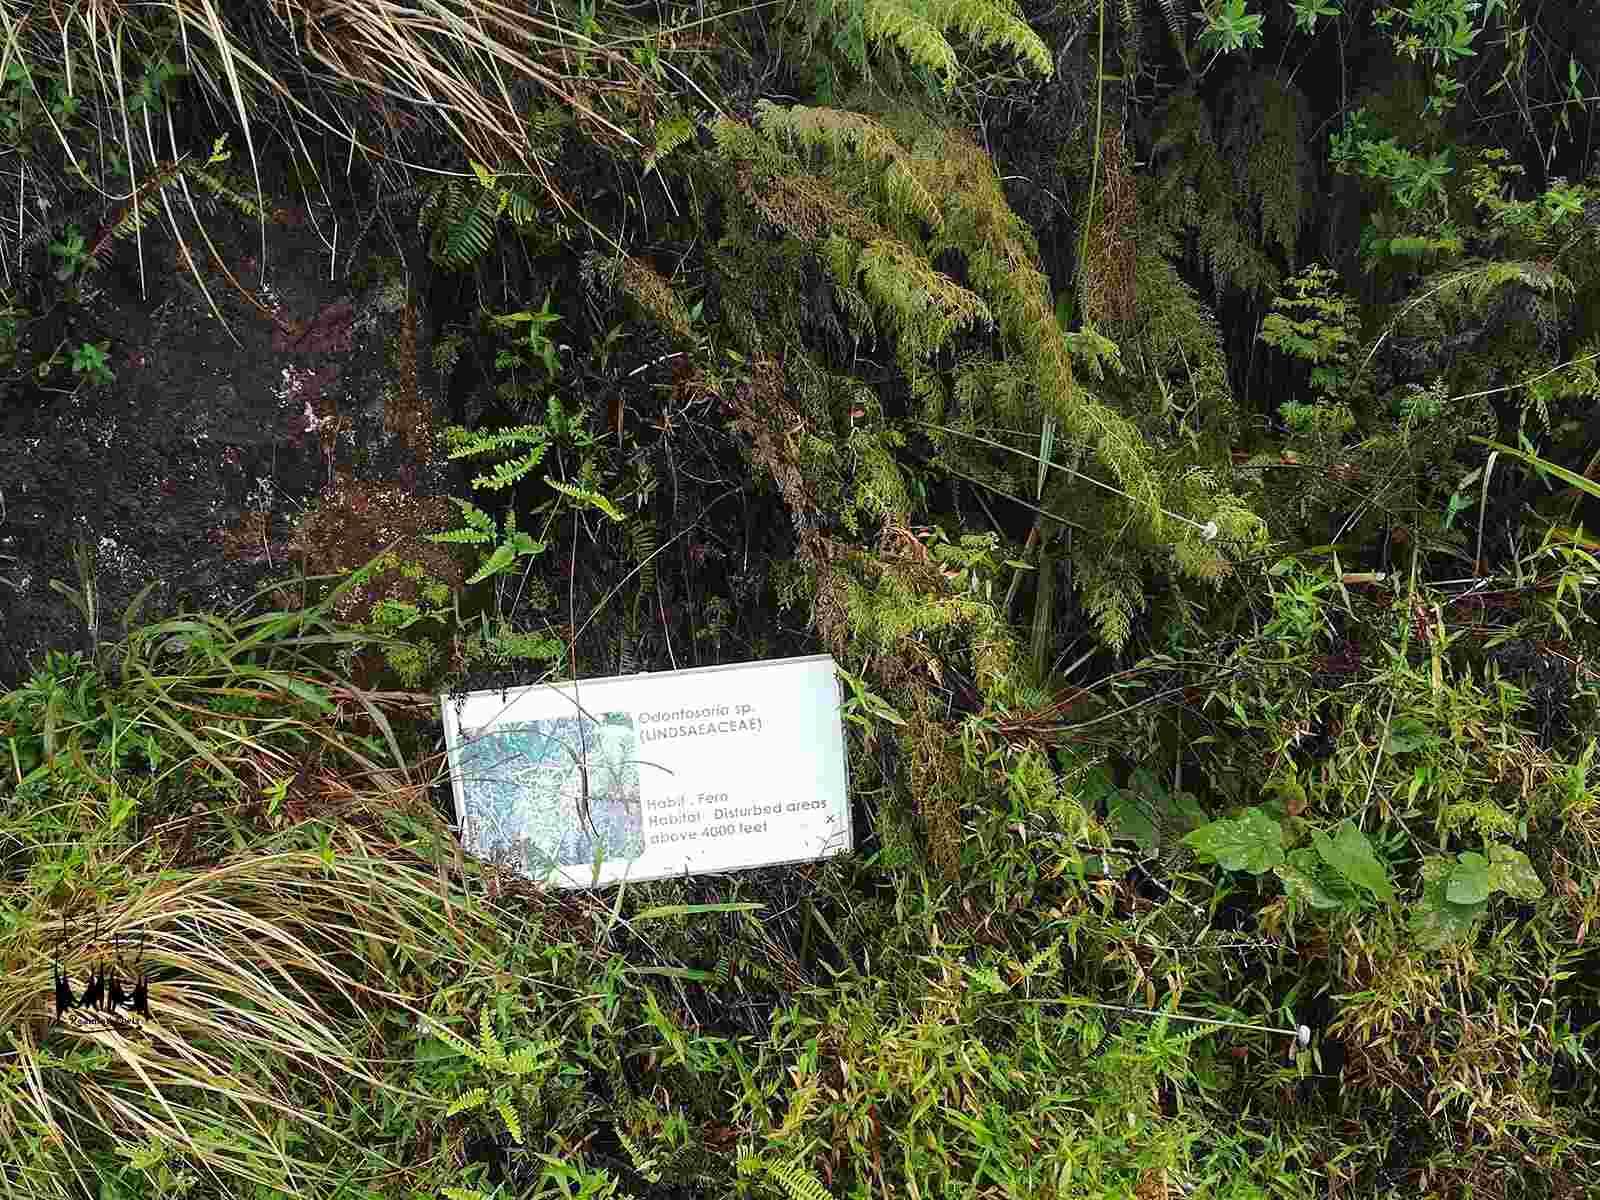 Odontosoria sp,Blechnum Orientala,Ferns disturbed areas,Dicranopteris linearis,Eravikulam national park fern